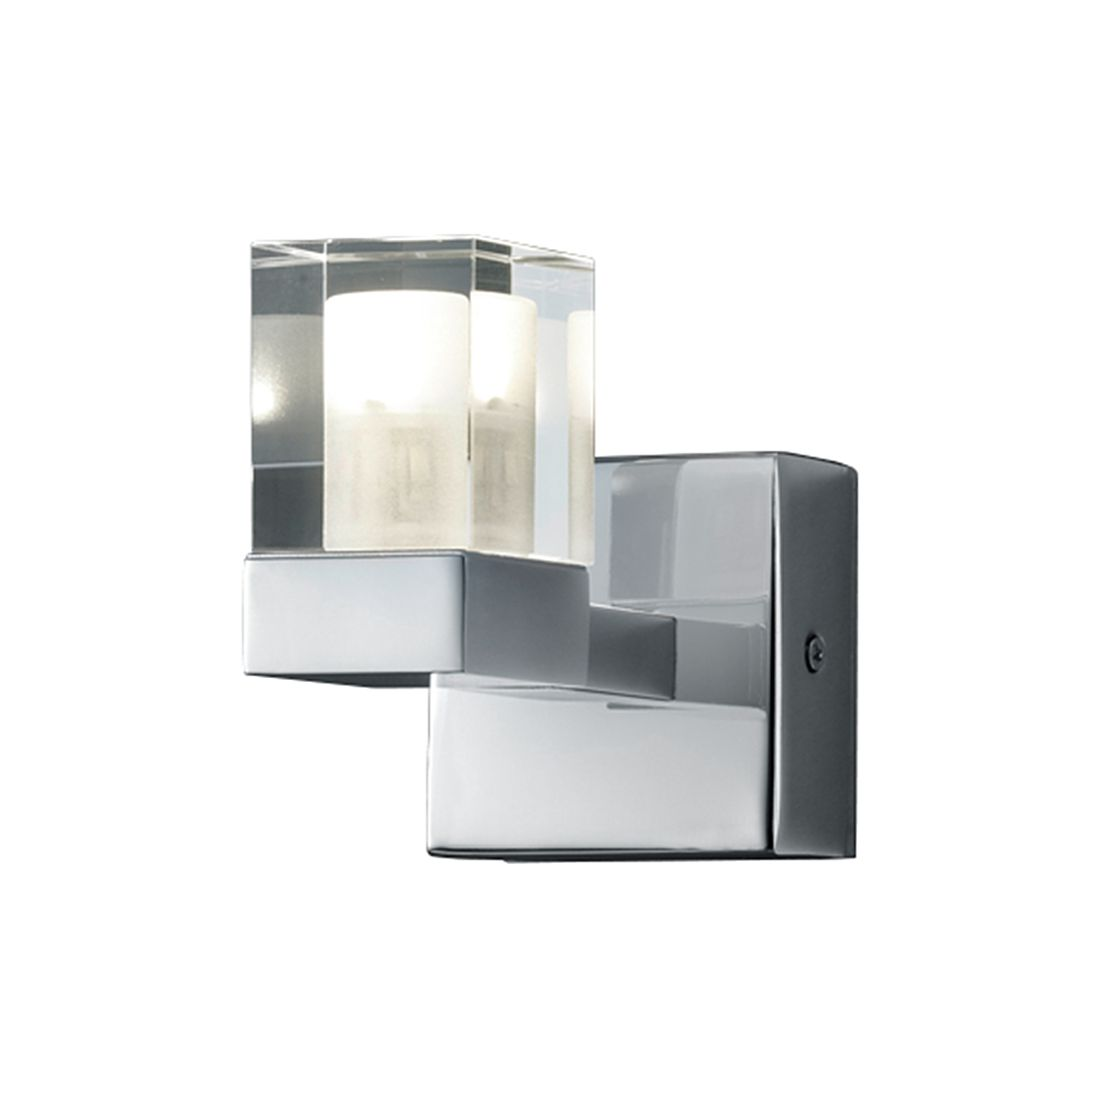 EEK A+, LED-Wandleuchte - Metall - Chrom - 1-flammig, Lux